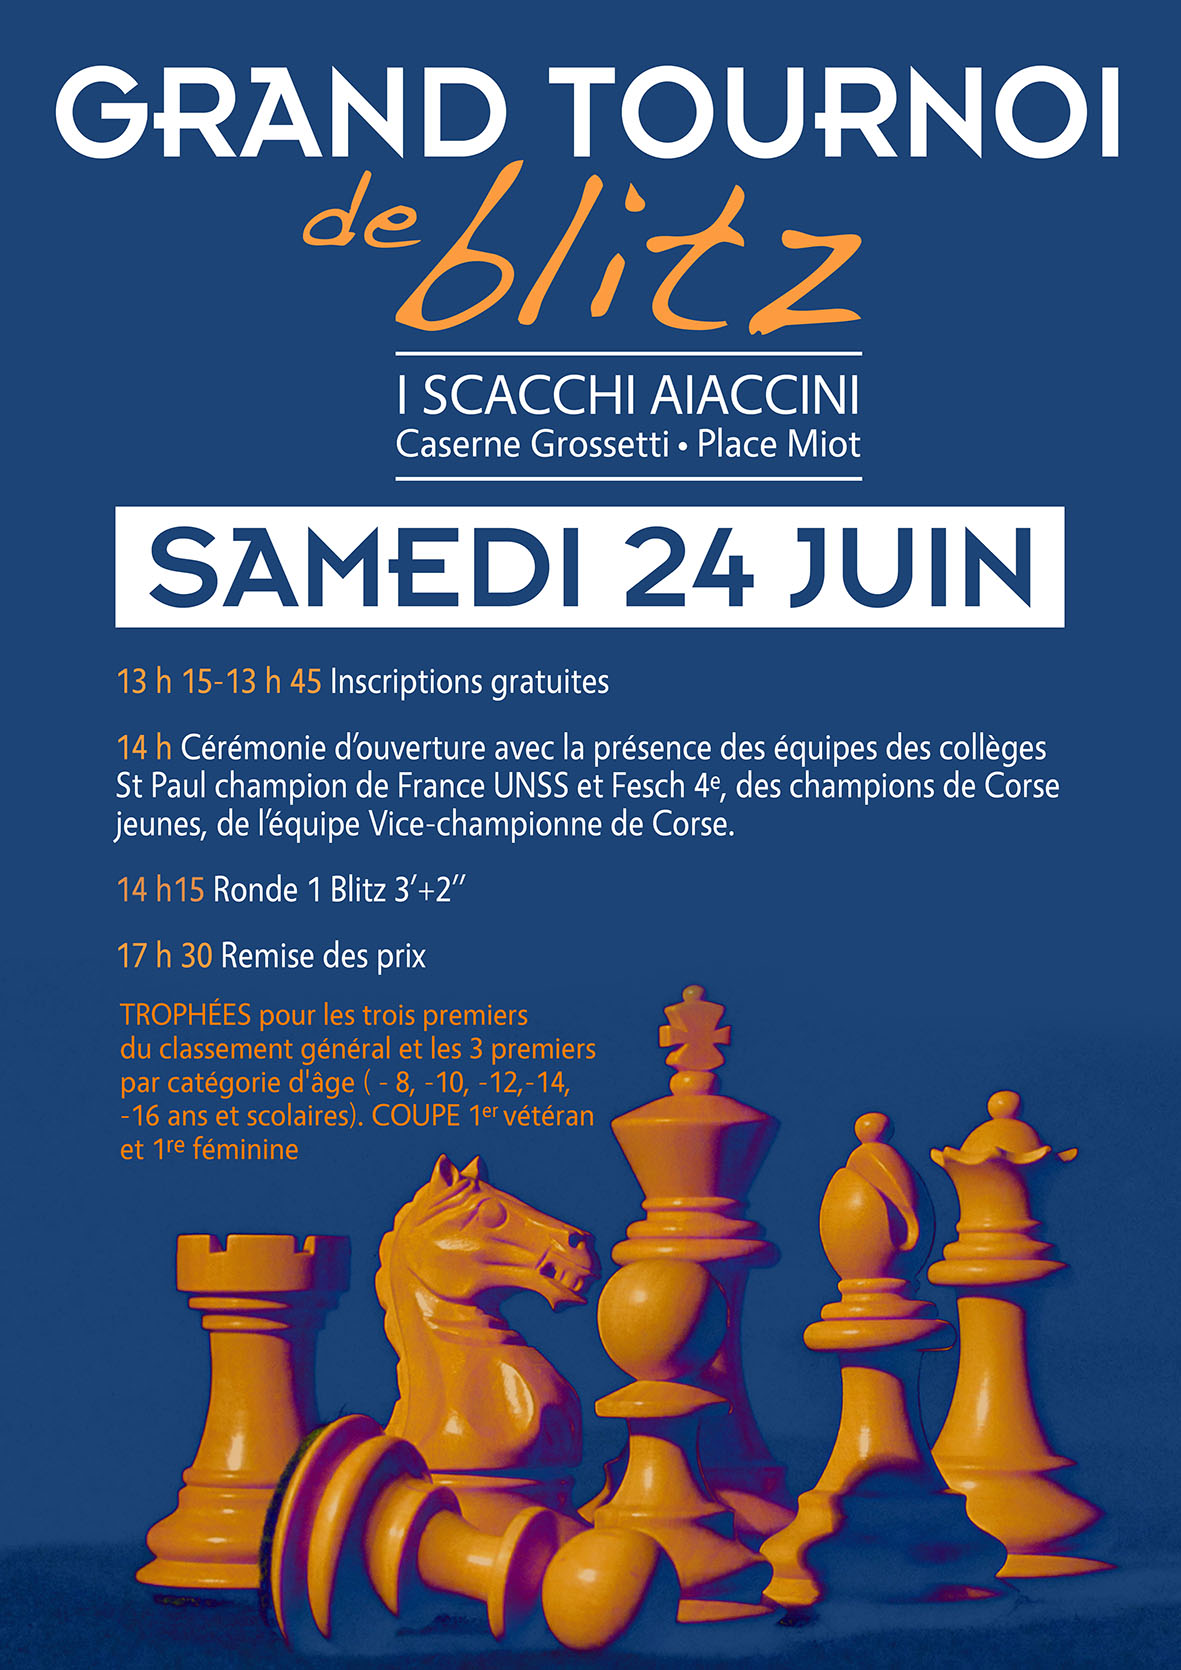 GRAND TOURNOI DE BLITZ I SCACCHI AIACCINI